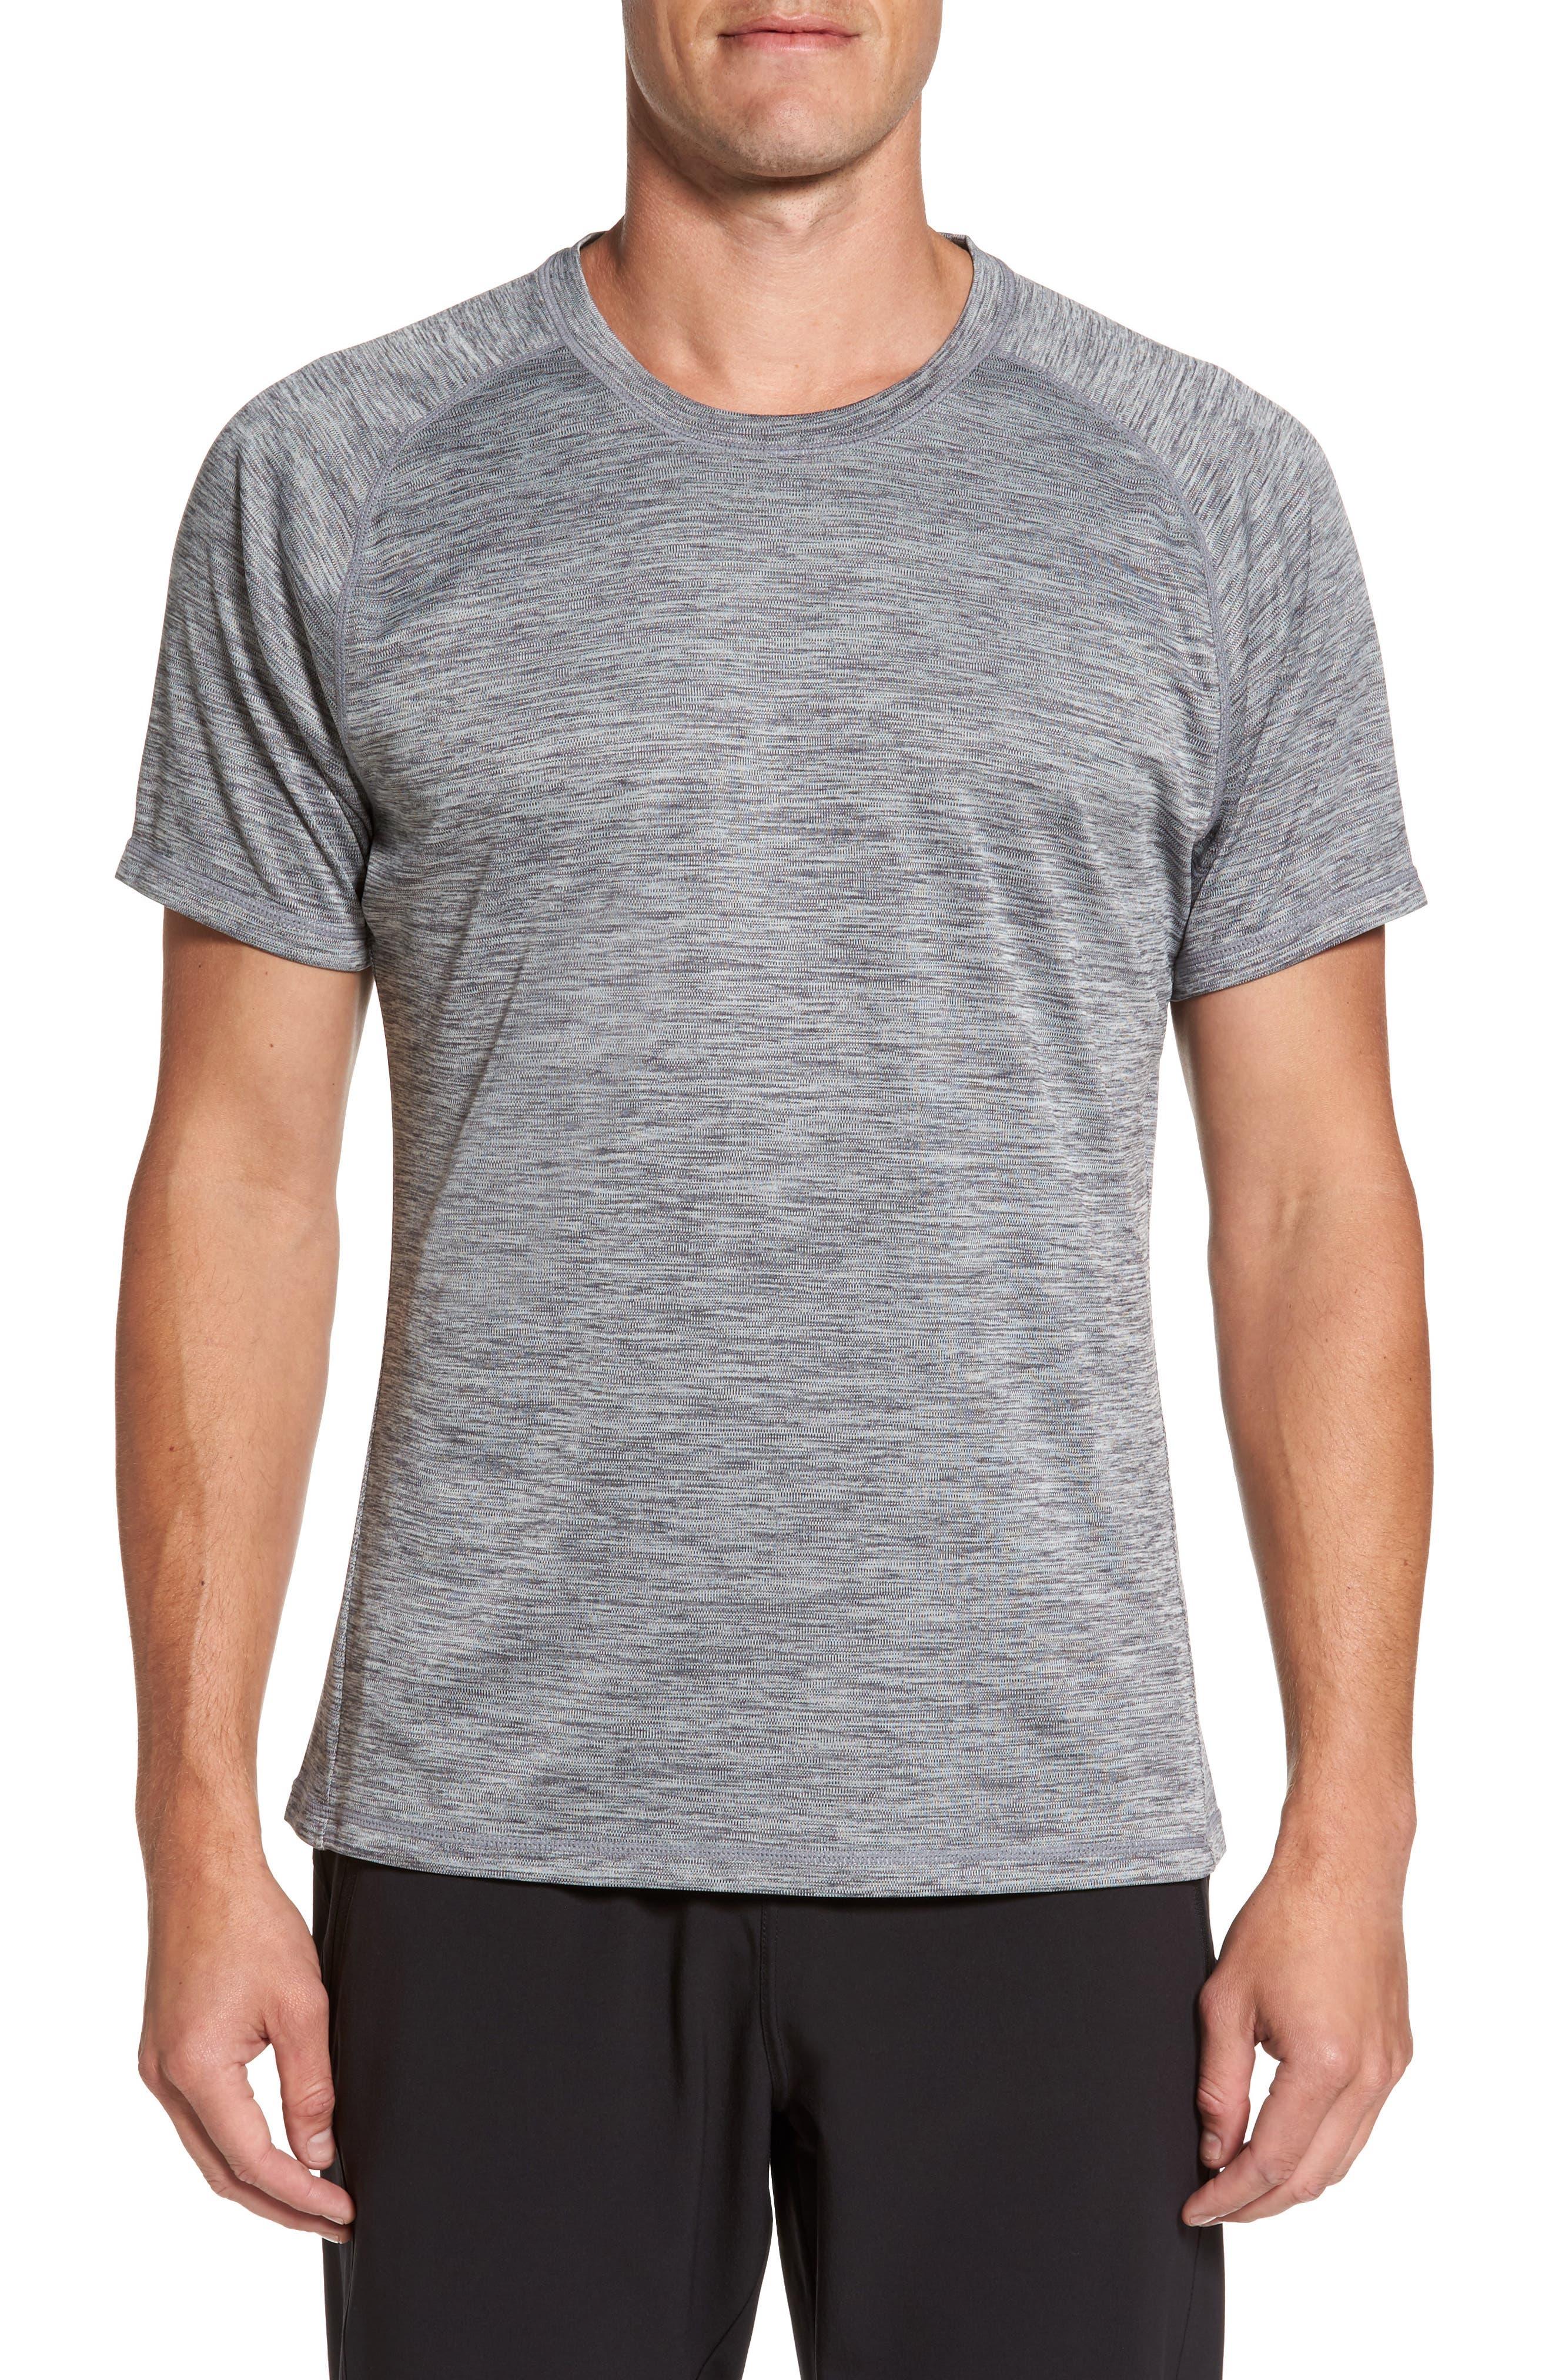 ZELLA Triplite T-Shirt, Main, color, 050